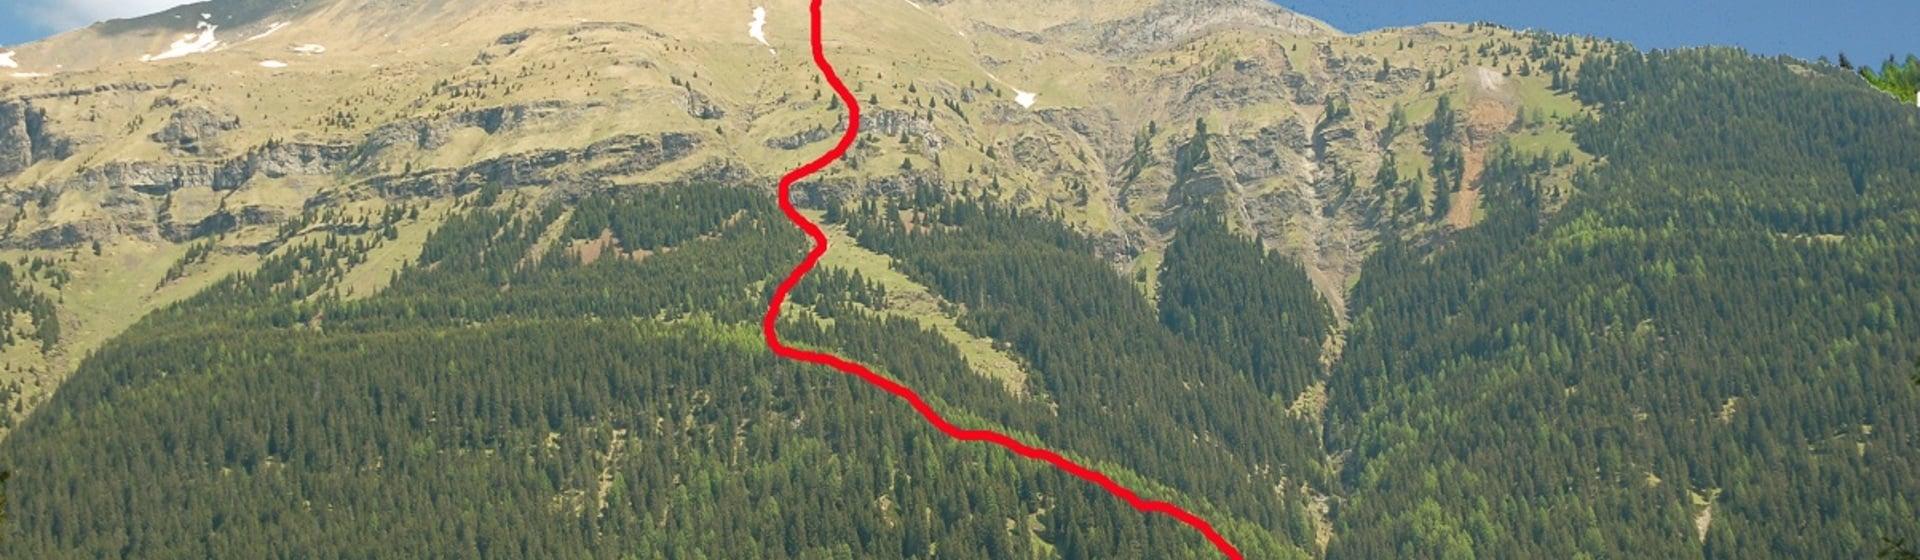 Sunday 22nd July 8 Vertical Col de Lana